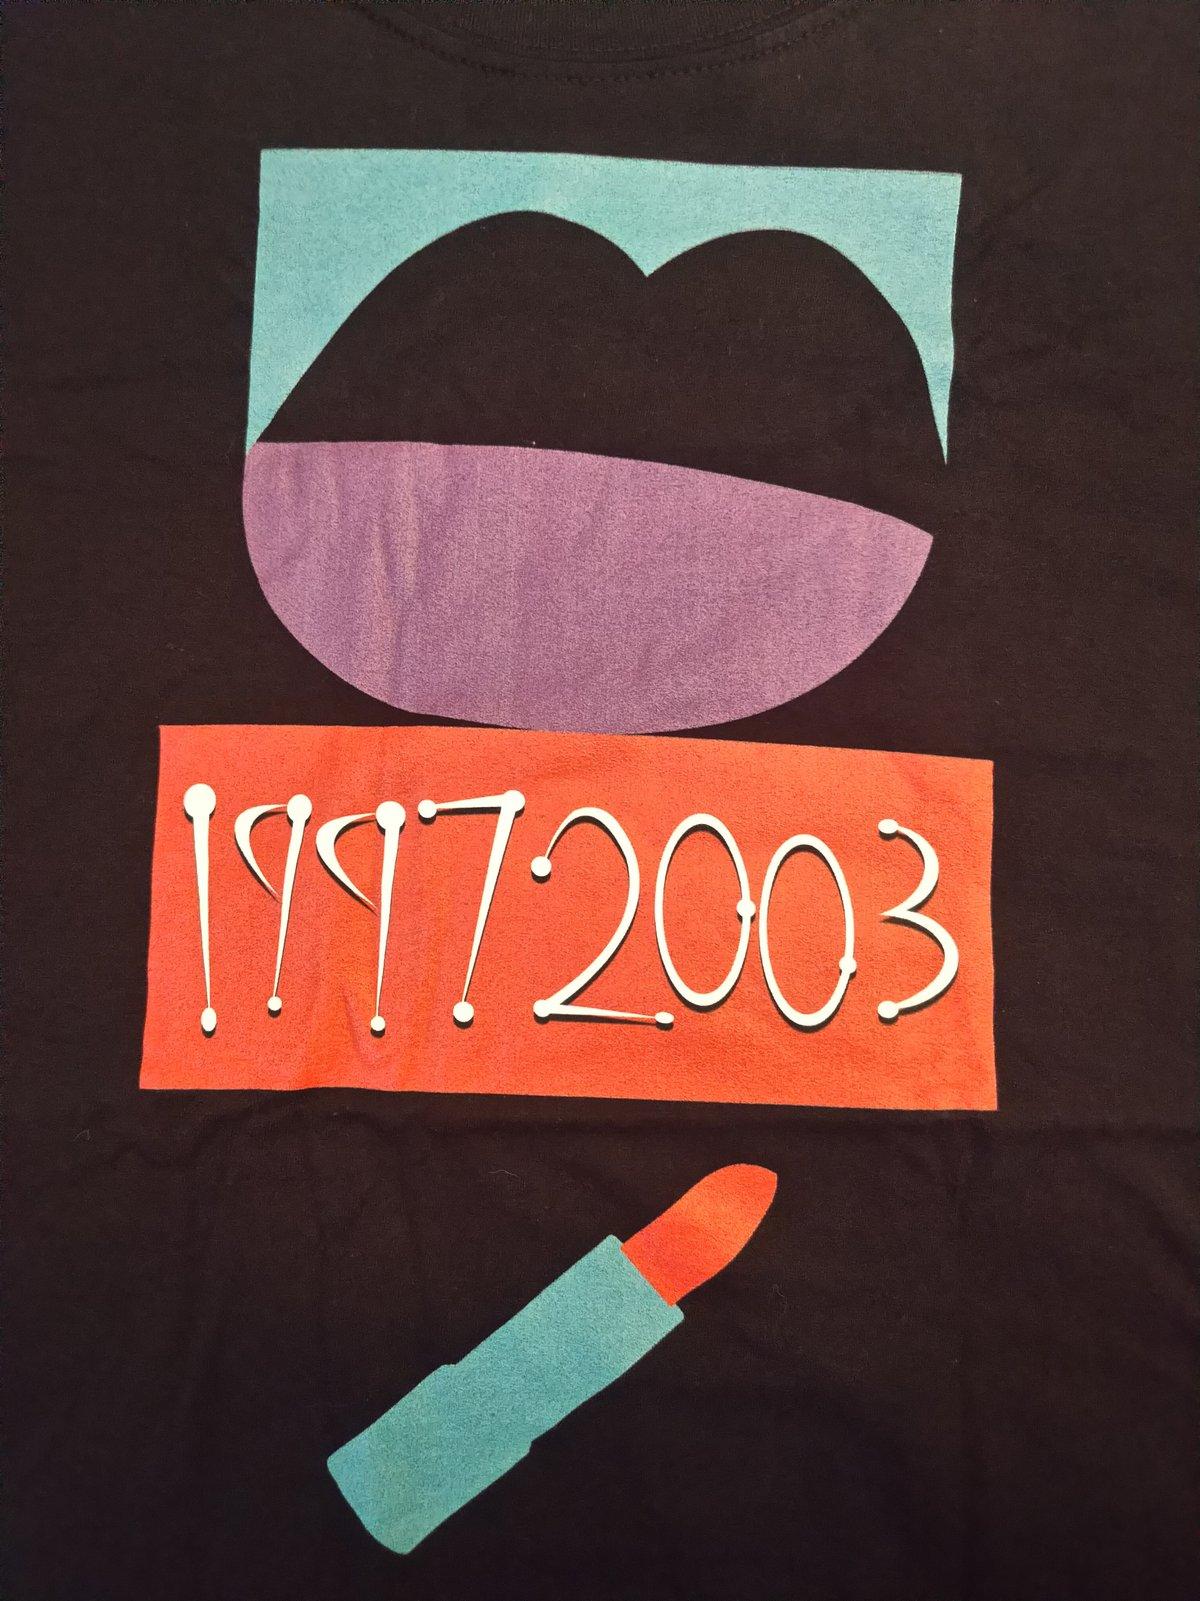 19972003 - SPICIER - T-SHIRT